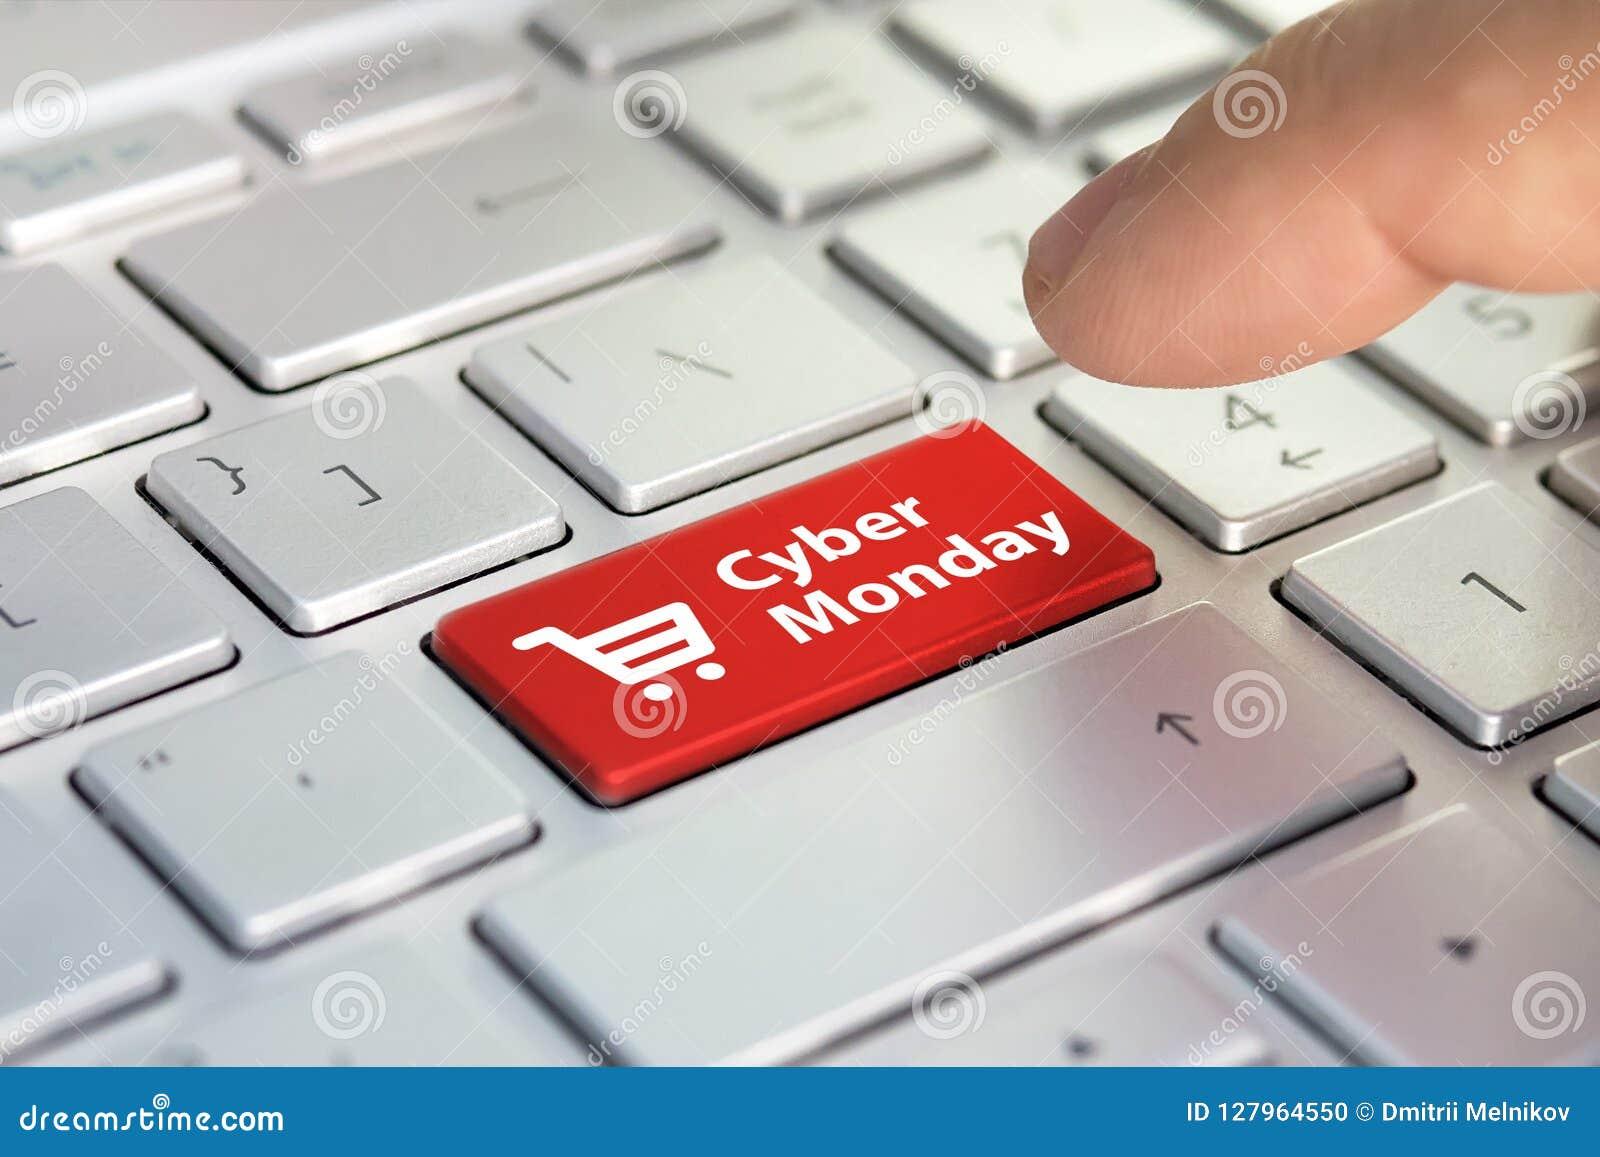 Cyber Monday on key board. shopping enter button key on keyboard. Color button on the gray silver keyboard of modern ultrabook. ca